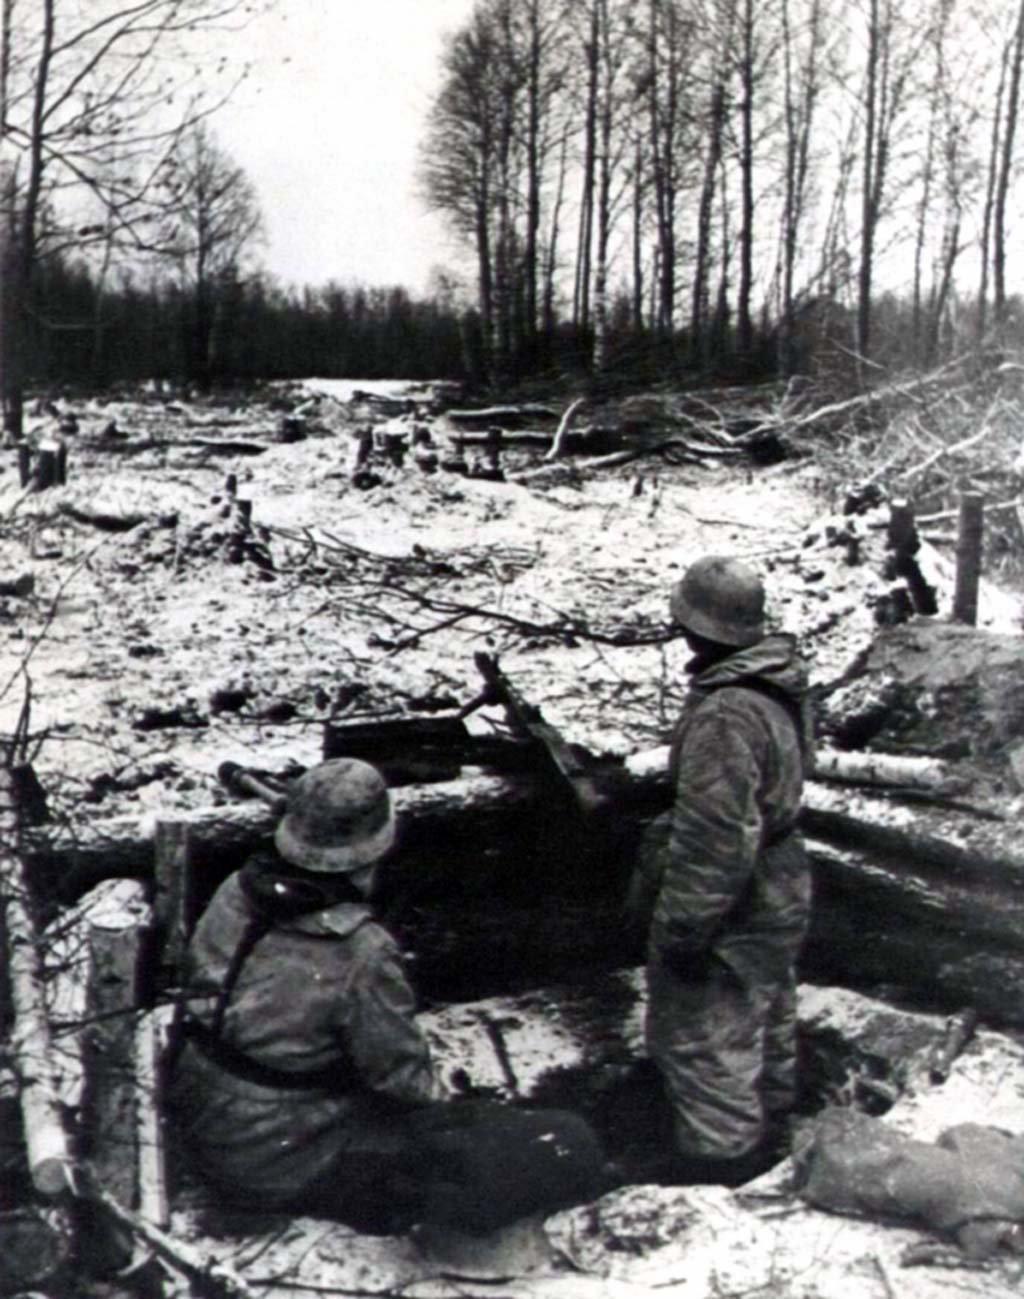 MG.42